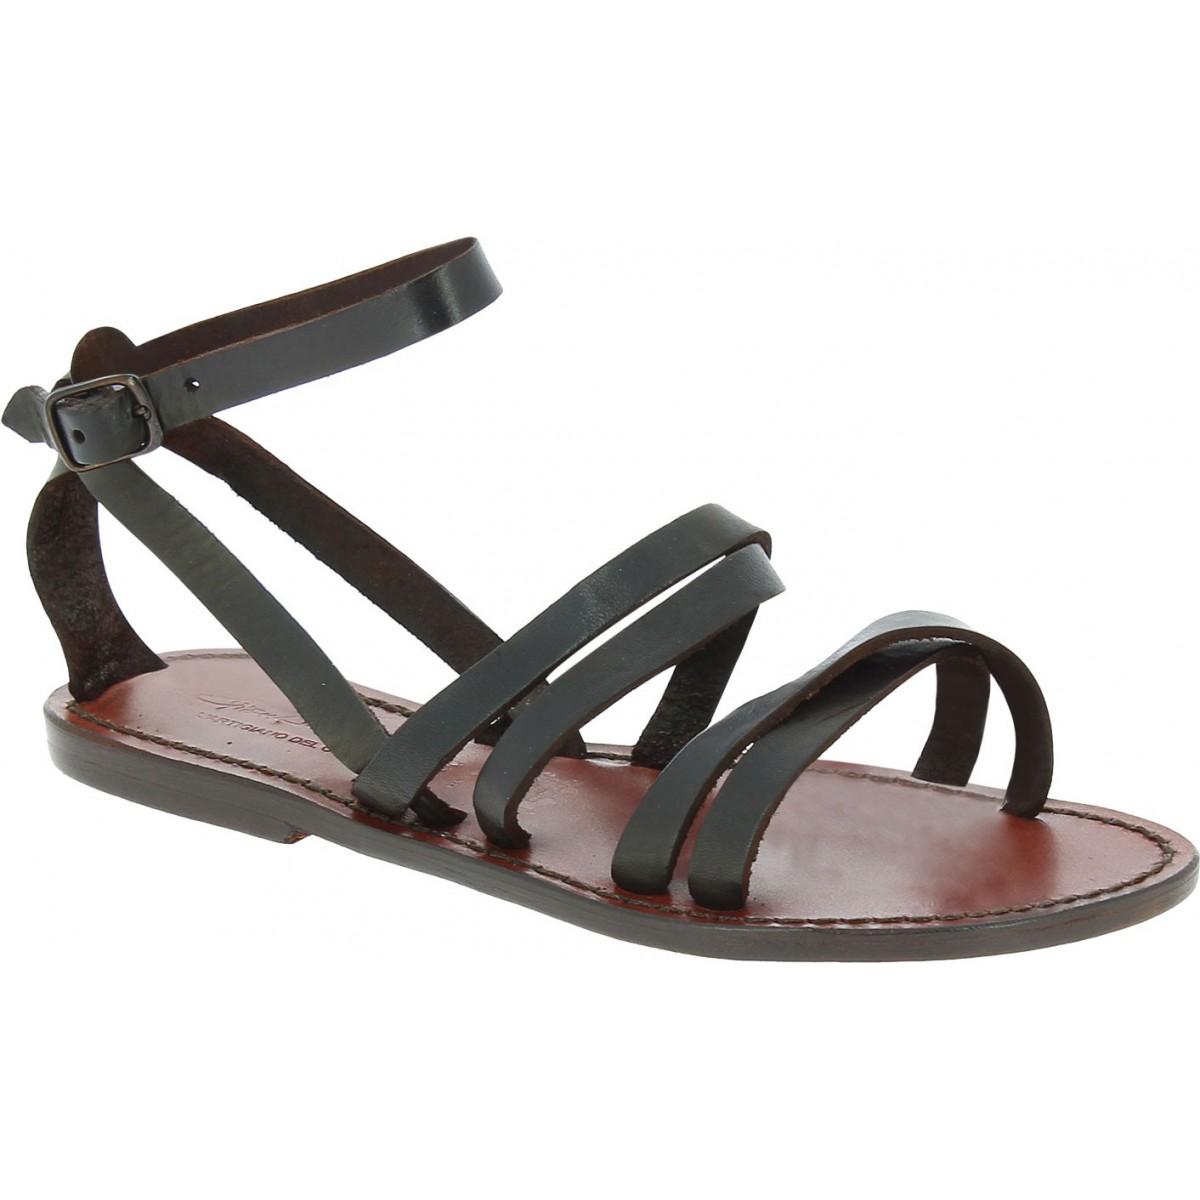 ec0ccc5409c2 Handmade women s flat sandals dark brown leather. Loading zoom